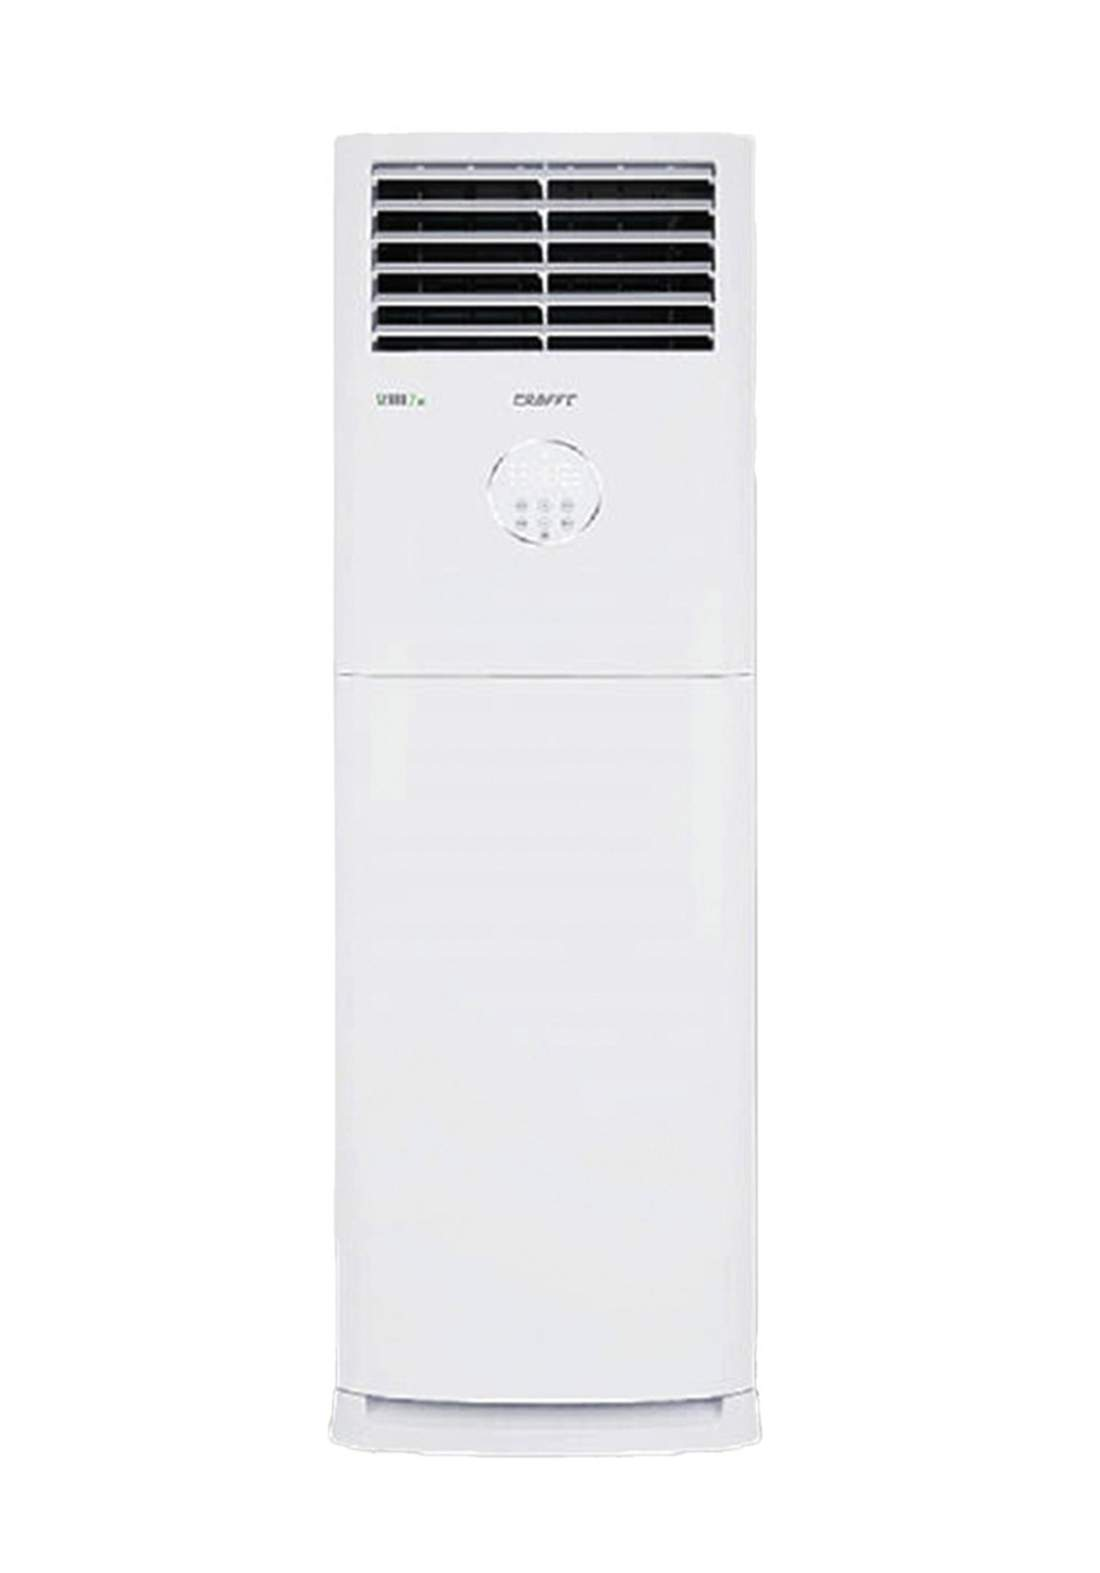 سبلت 2 طن عامودي حار-بارد سيرا  Crafft R22